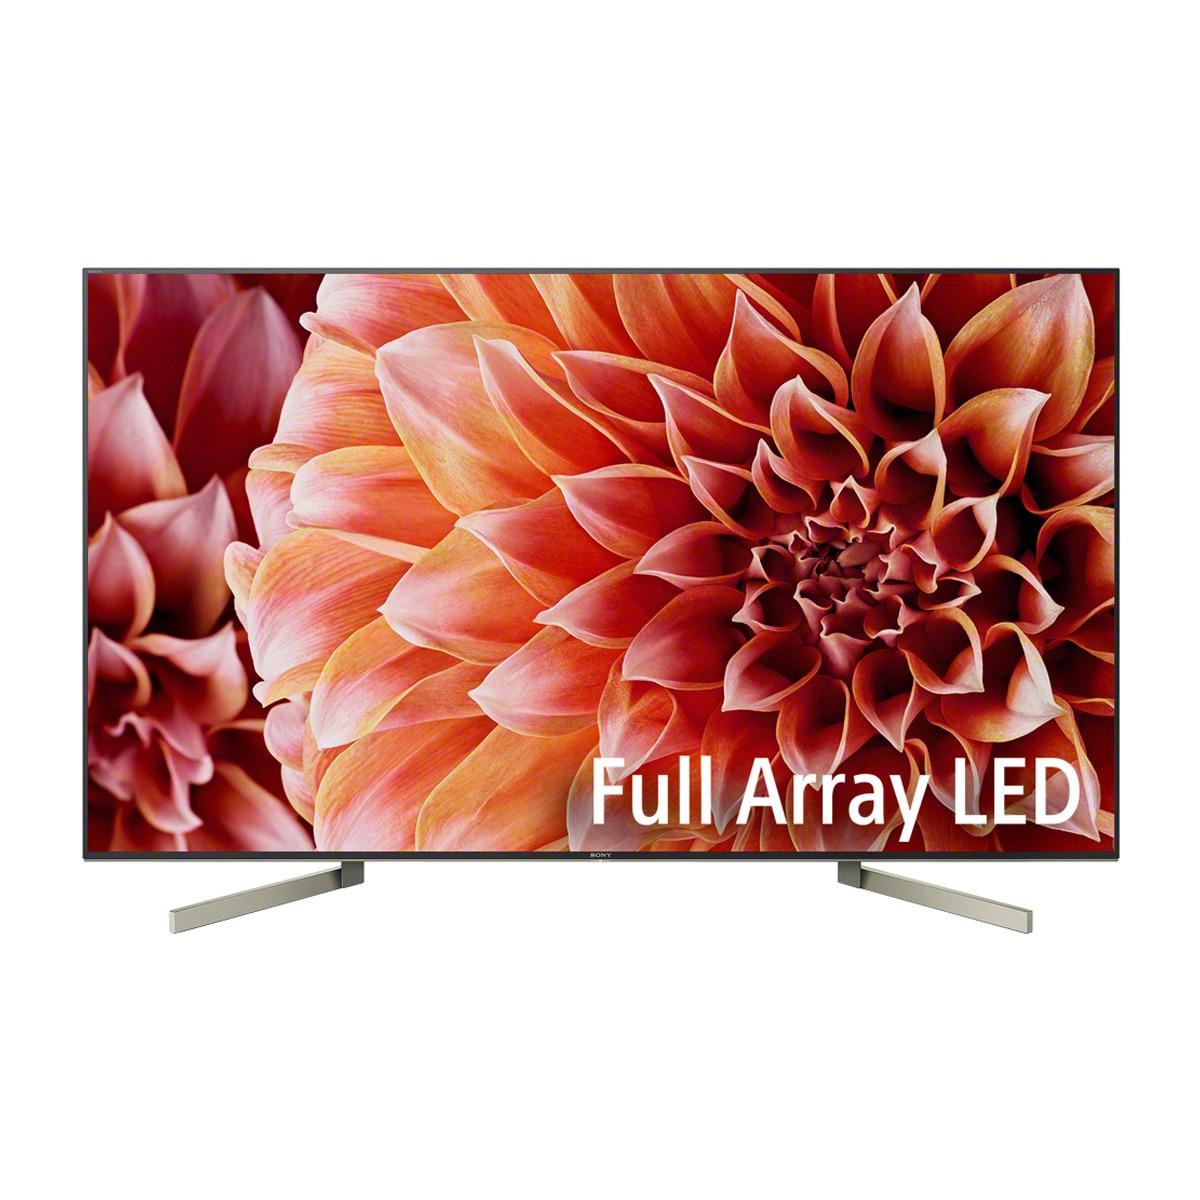 "TV LED 65"" - Sony KD-65XF9005 UHD 4K HDR Processor X1 Extreme, Full Array"